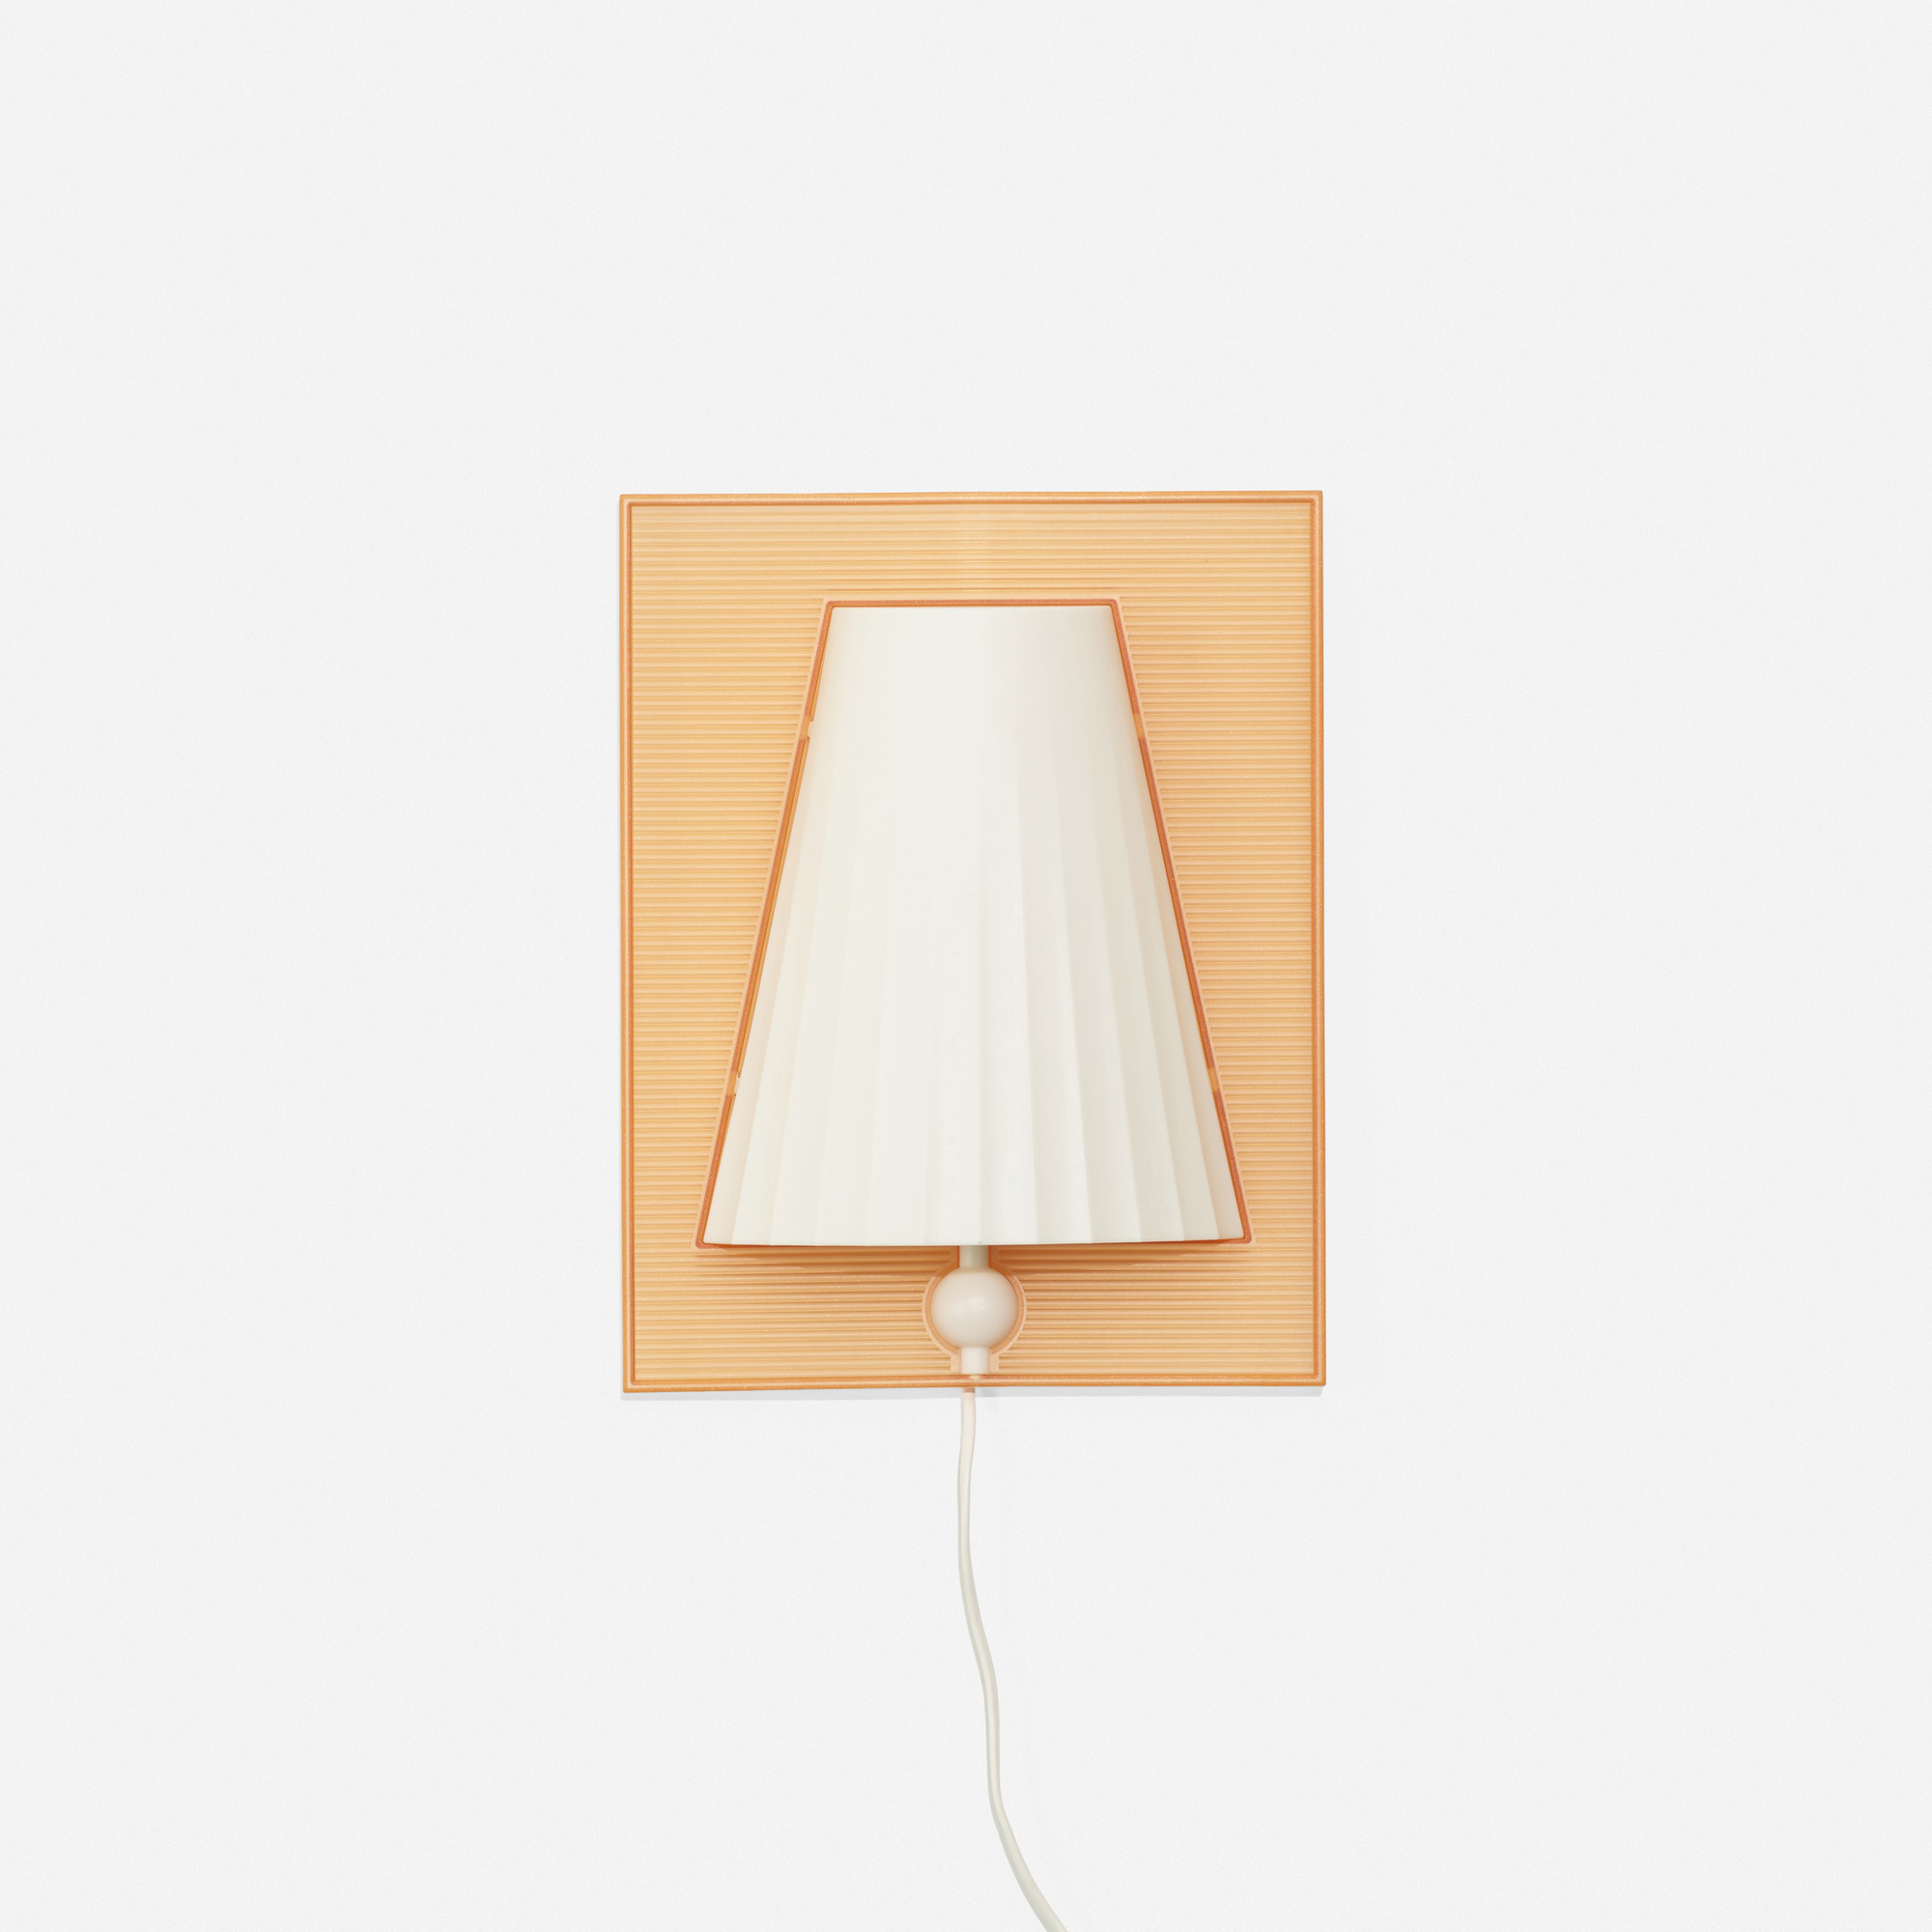 388: Philippe Starck / Walla Walla wall sconce (1 of 2)